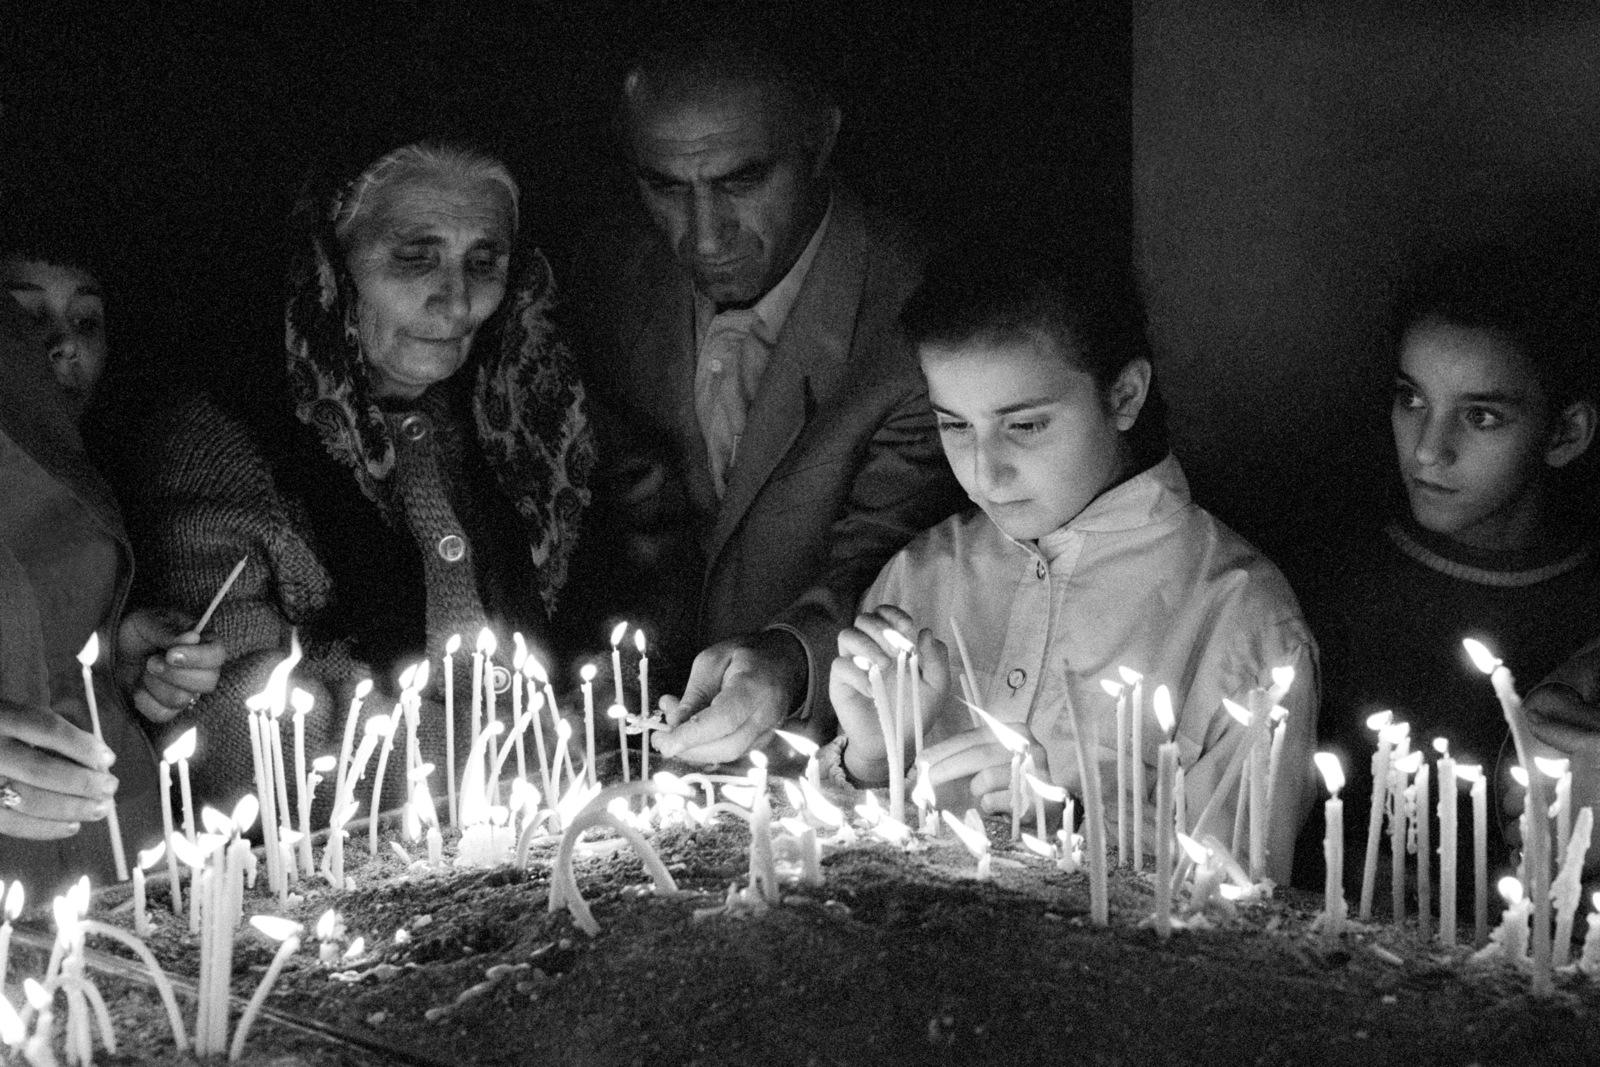 2015-04-19-1429486140-3622584-ArmenianChurchWorshippersRW.jpg